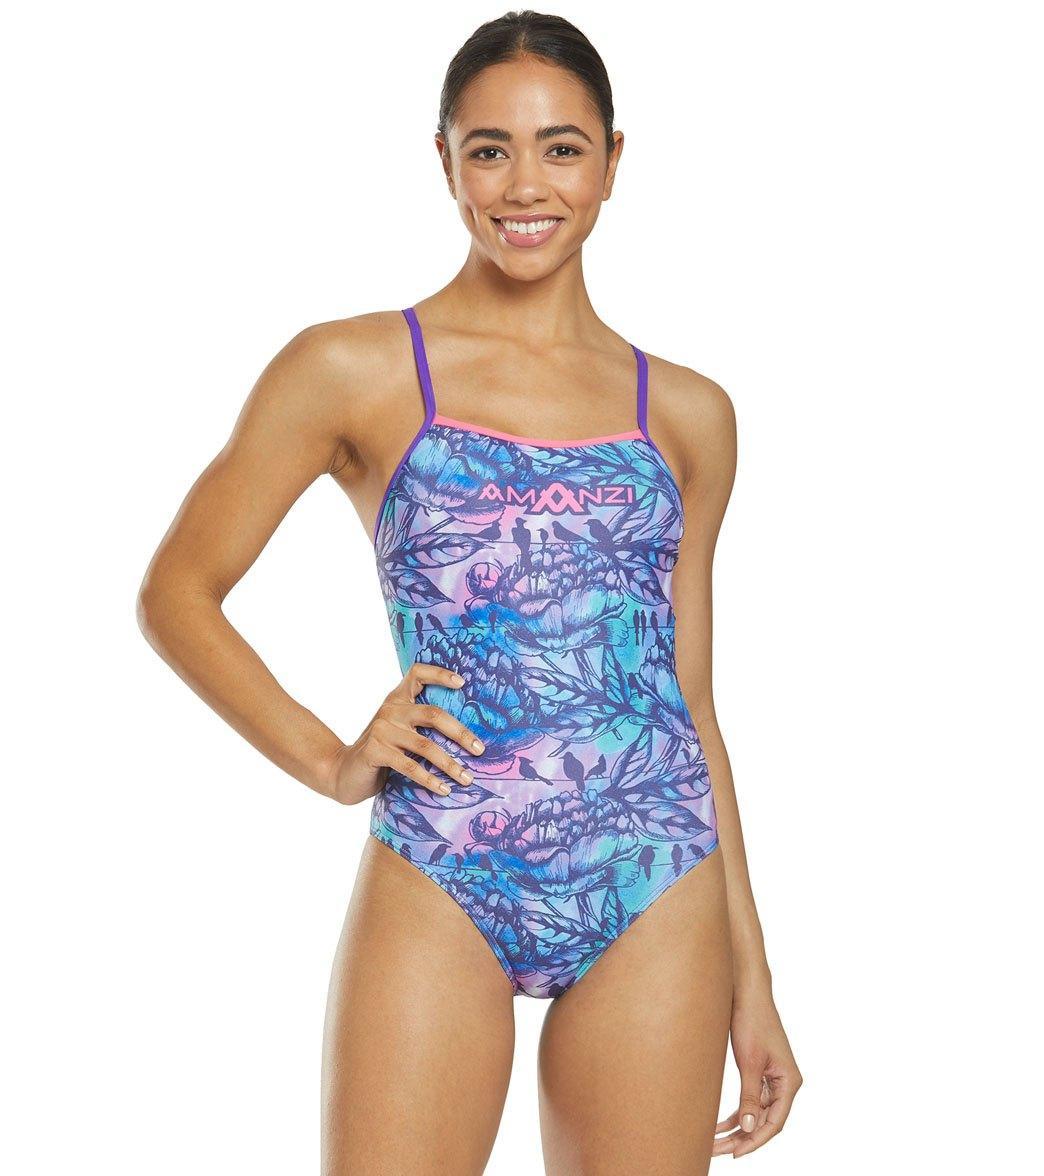 Amanzi Women's Leilani One Piece Swimsuit -